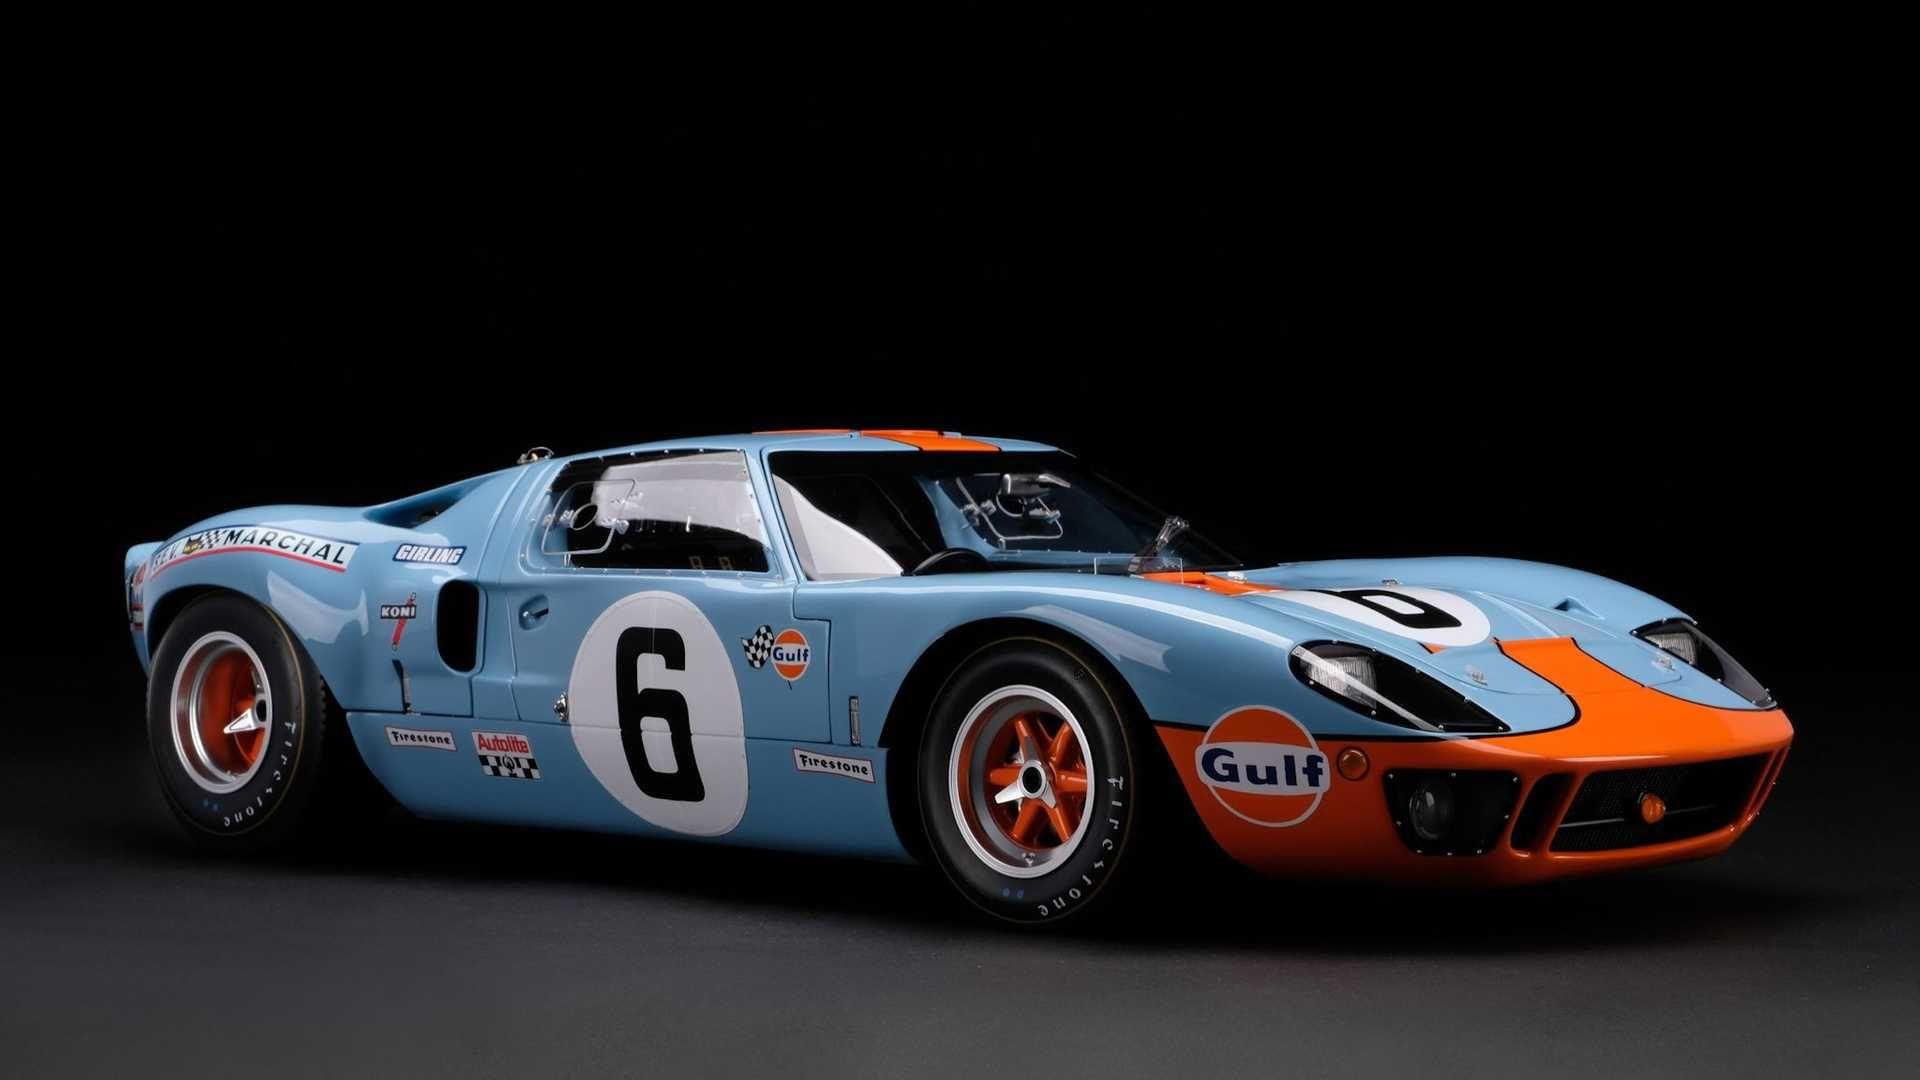 Amalgam 推出超精細 1:8 比例的 Ford GT40 賽車模型